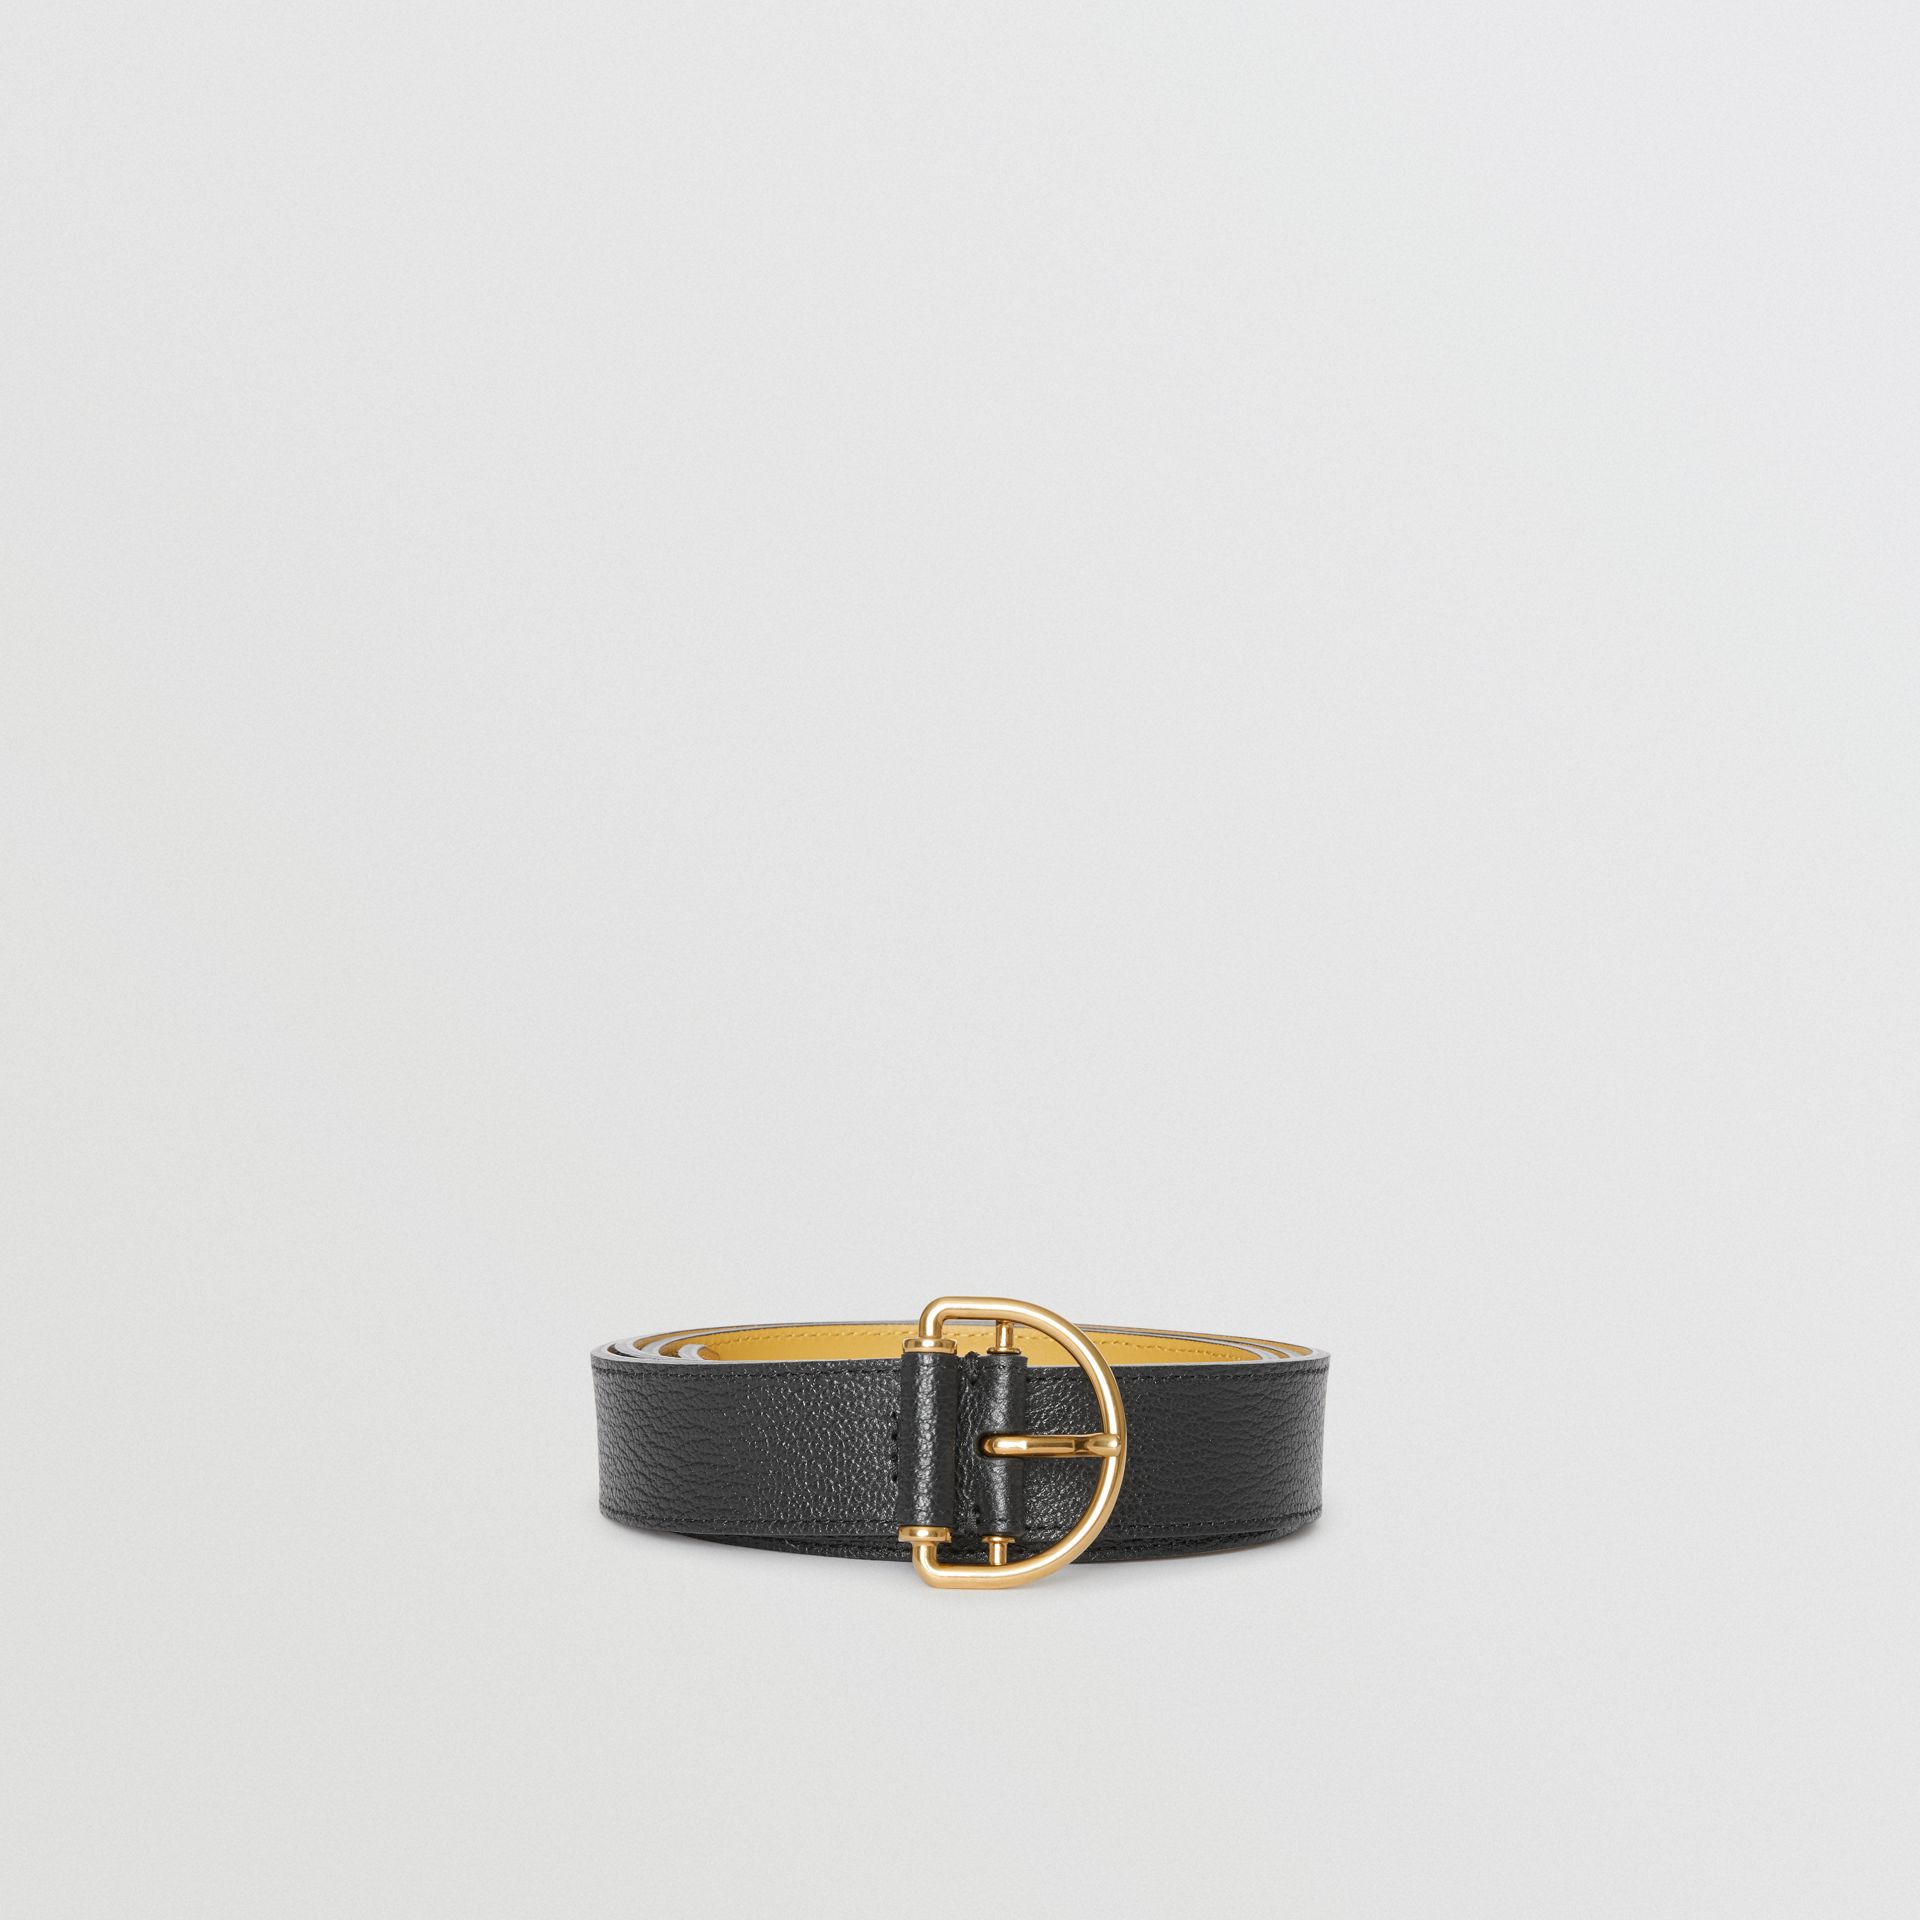 Grainy Leather D-ring Belt in Black/cornflower - Women | Burberry Australia - gallery image 3